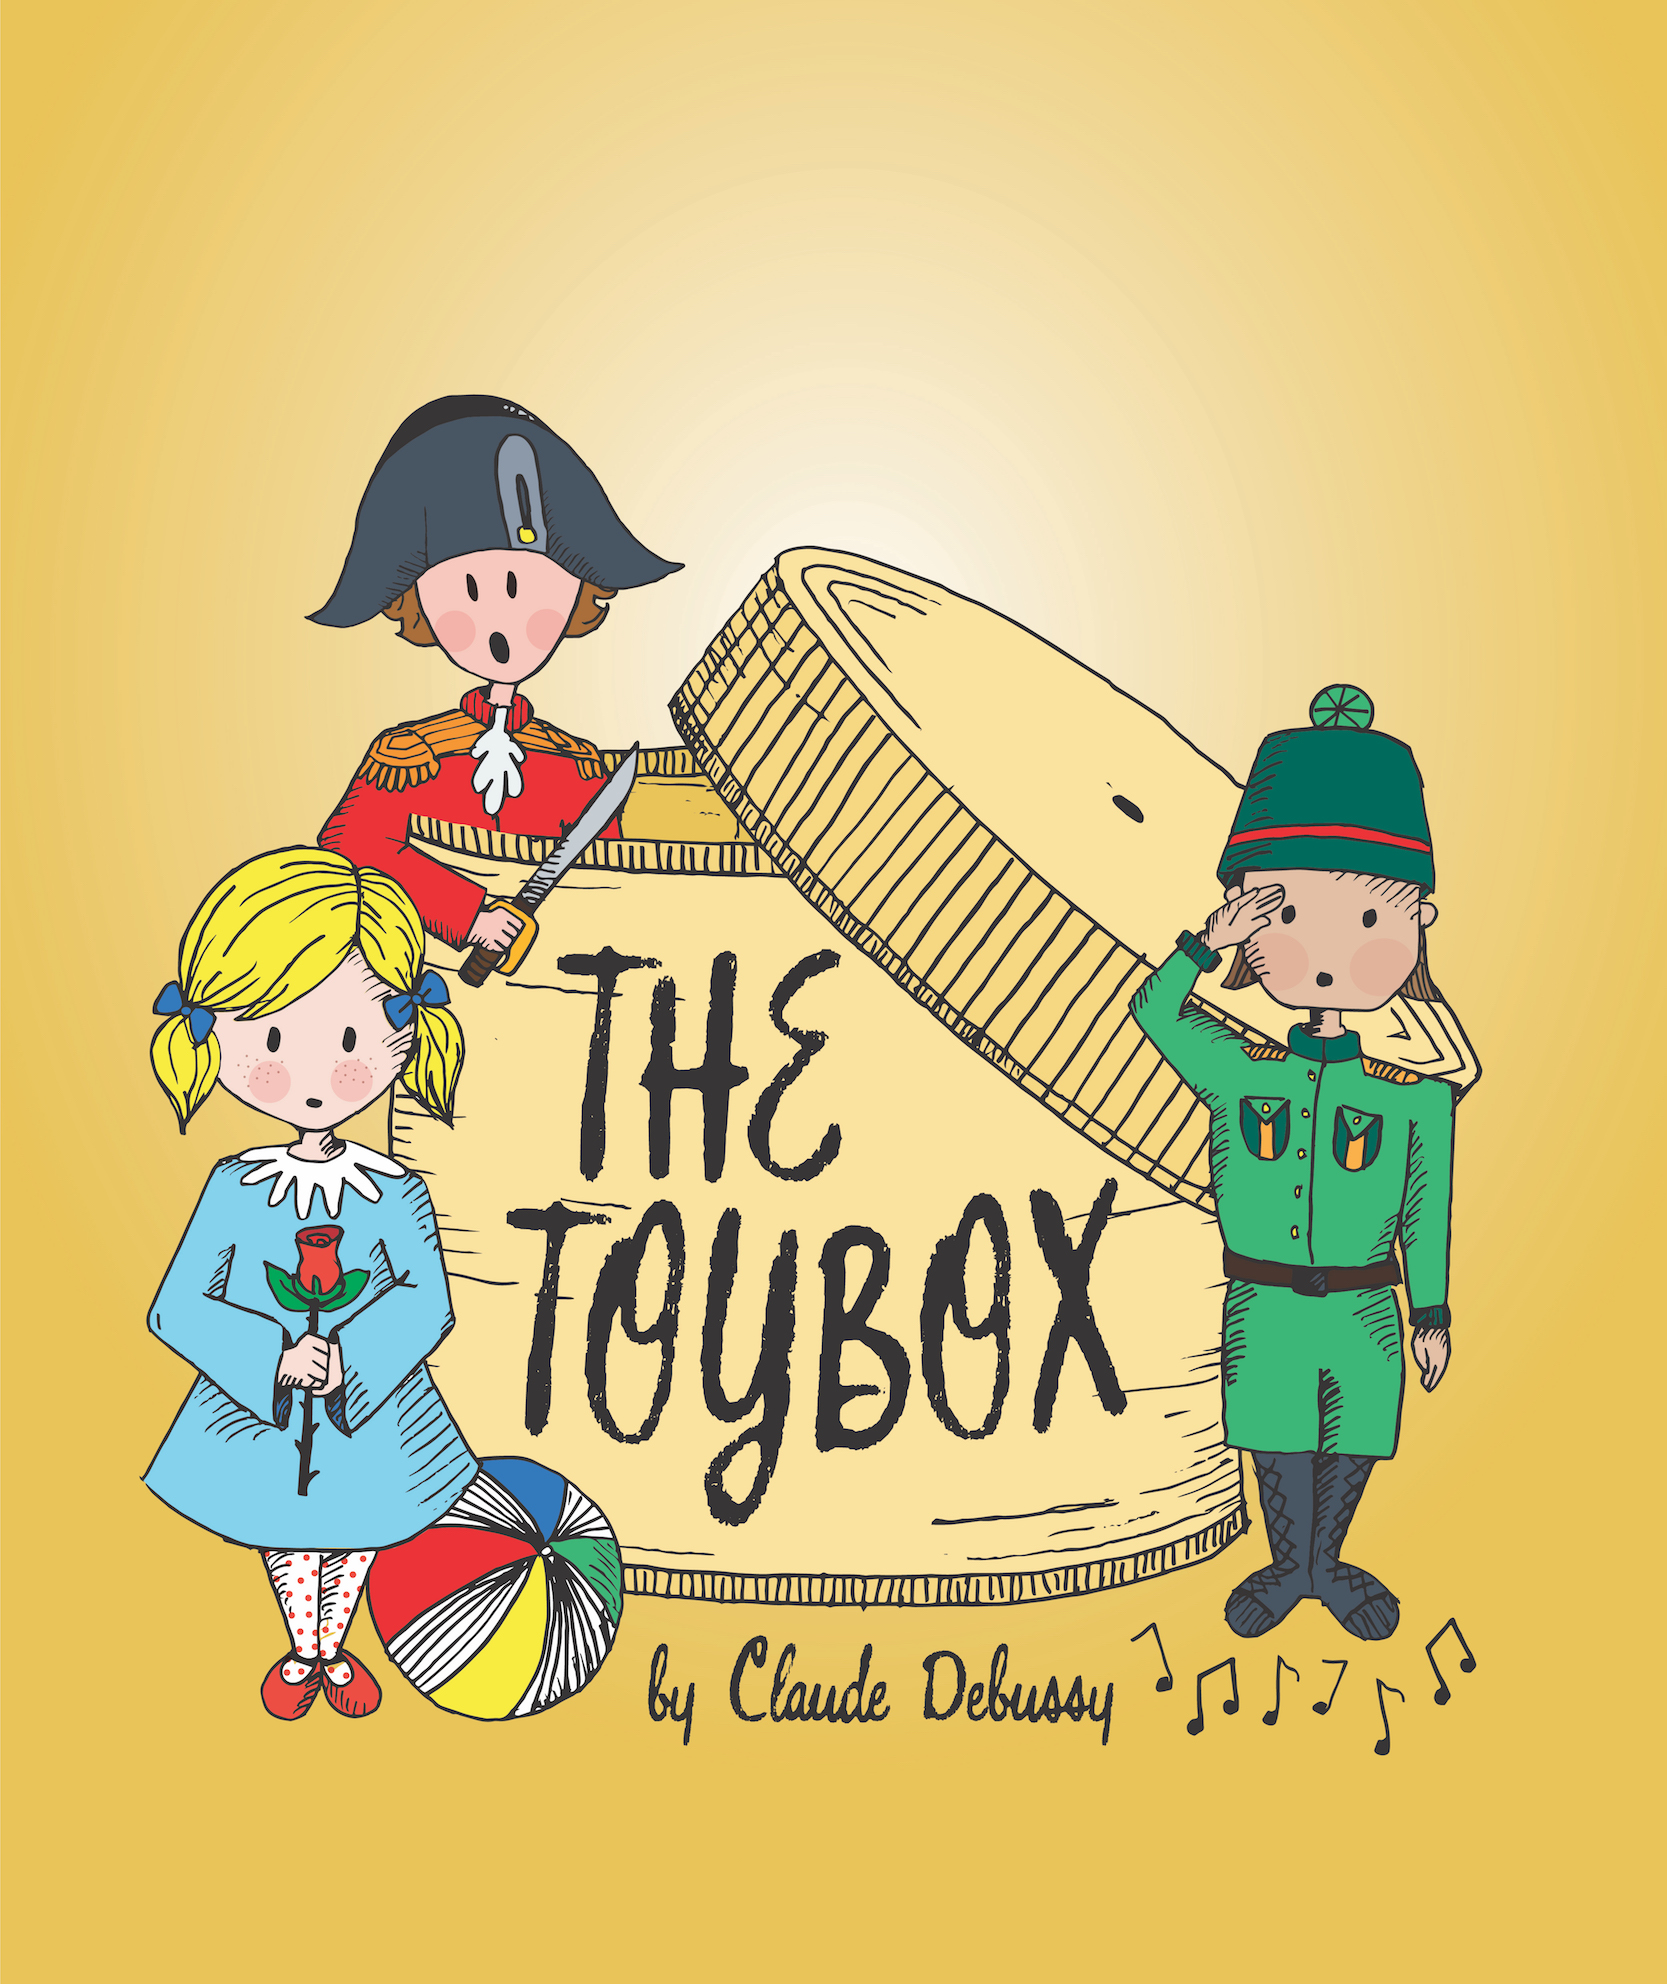 toybox_illustration_background.jpg